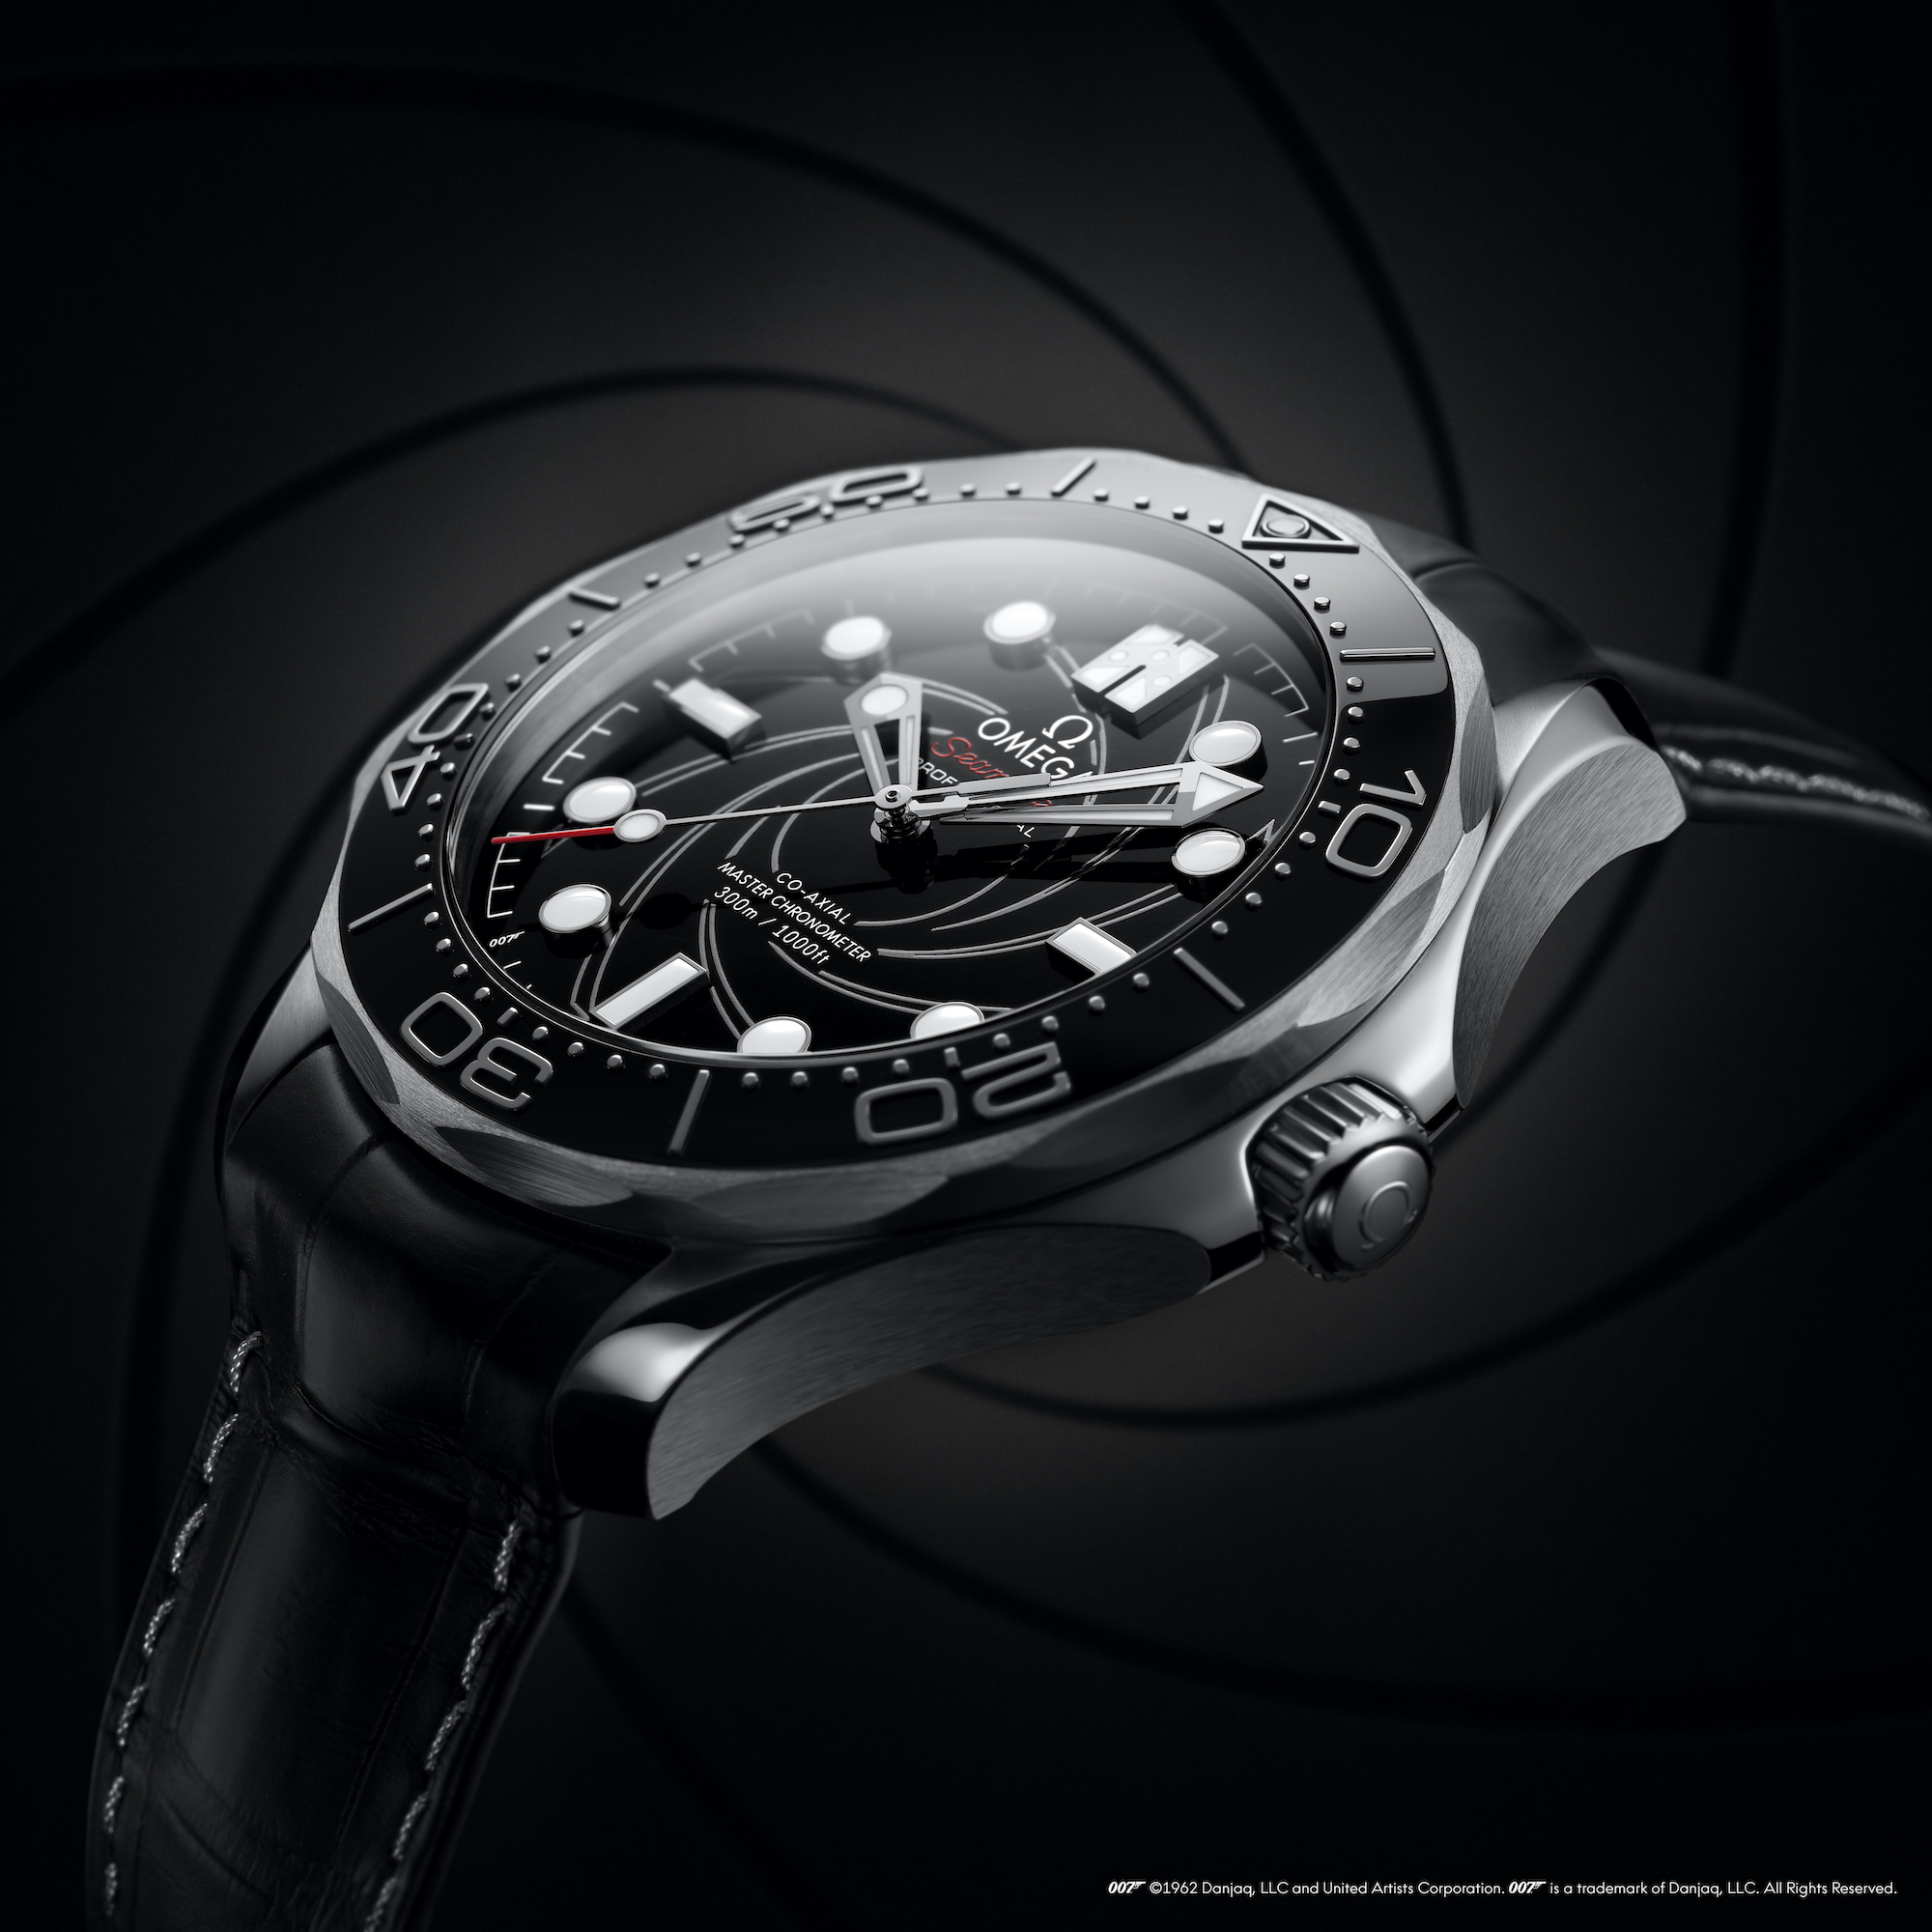 Omega Seamaster Diver 300M James Bond Platino Oro 210.93.42.20.01.001 detalle